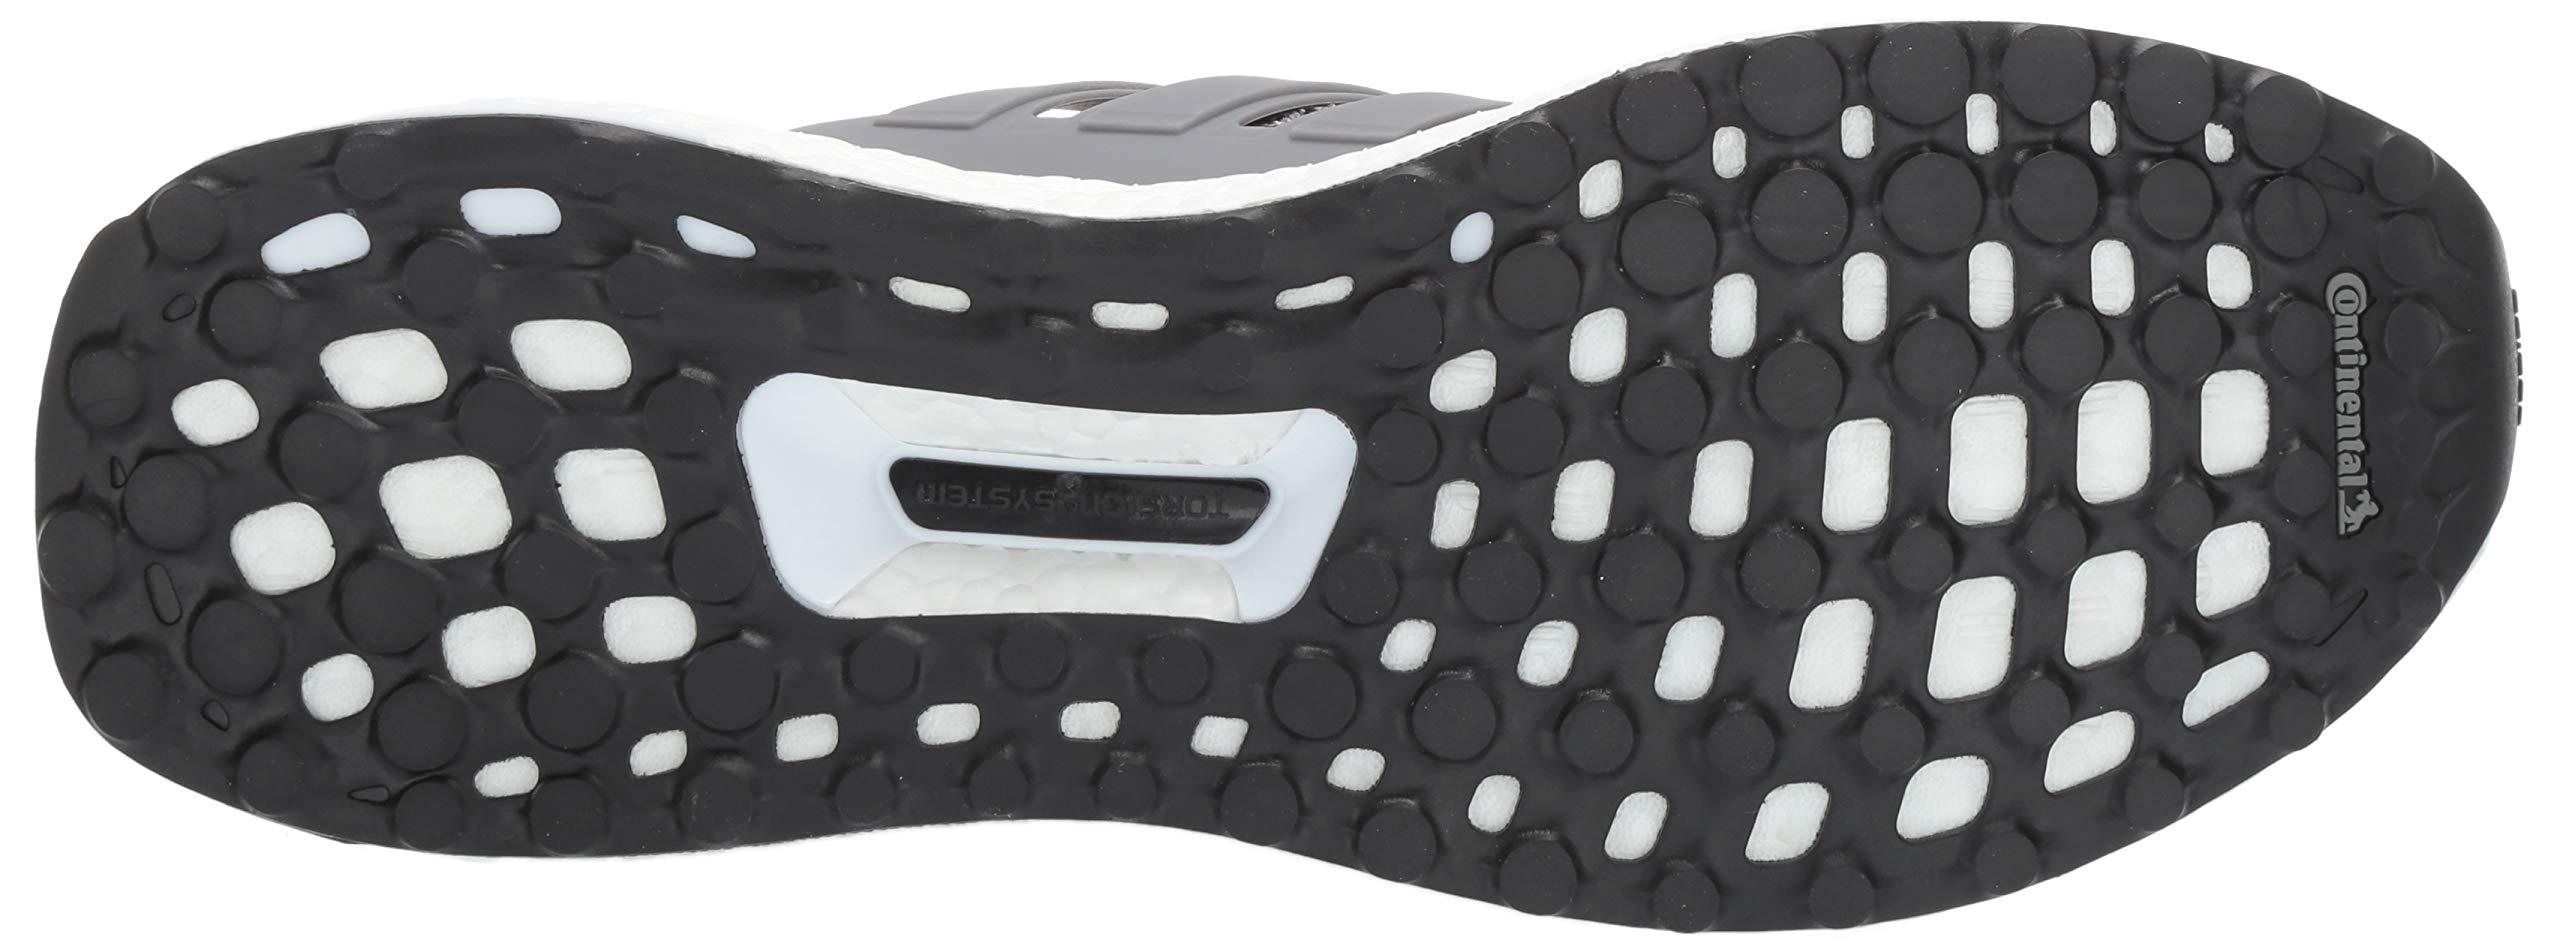 adidas Men's Ultraboost, Grey/Black, 4 M US by adidas (Image #3)